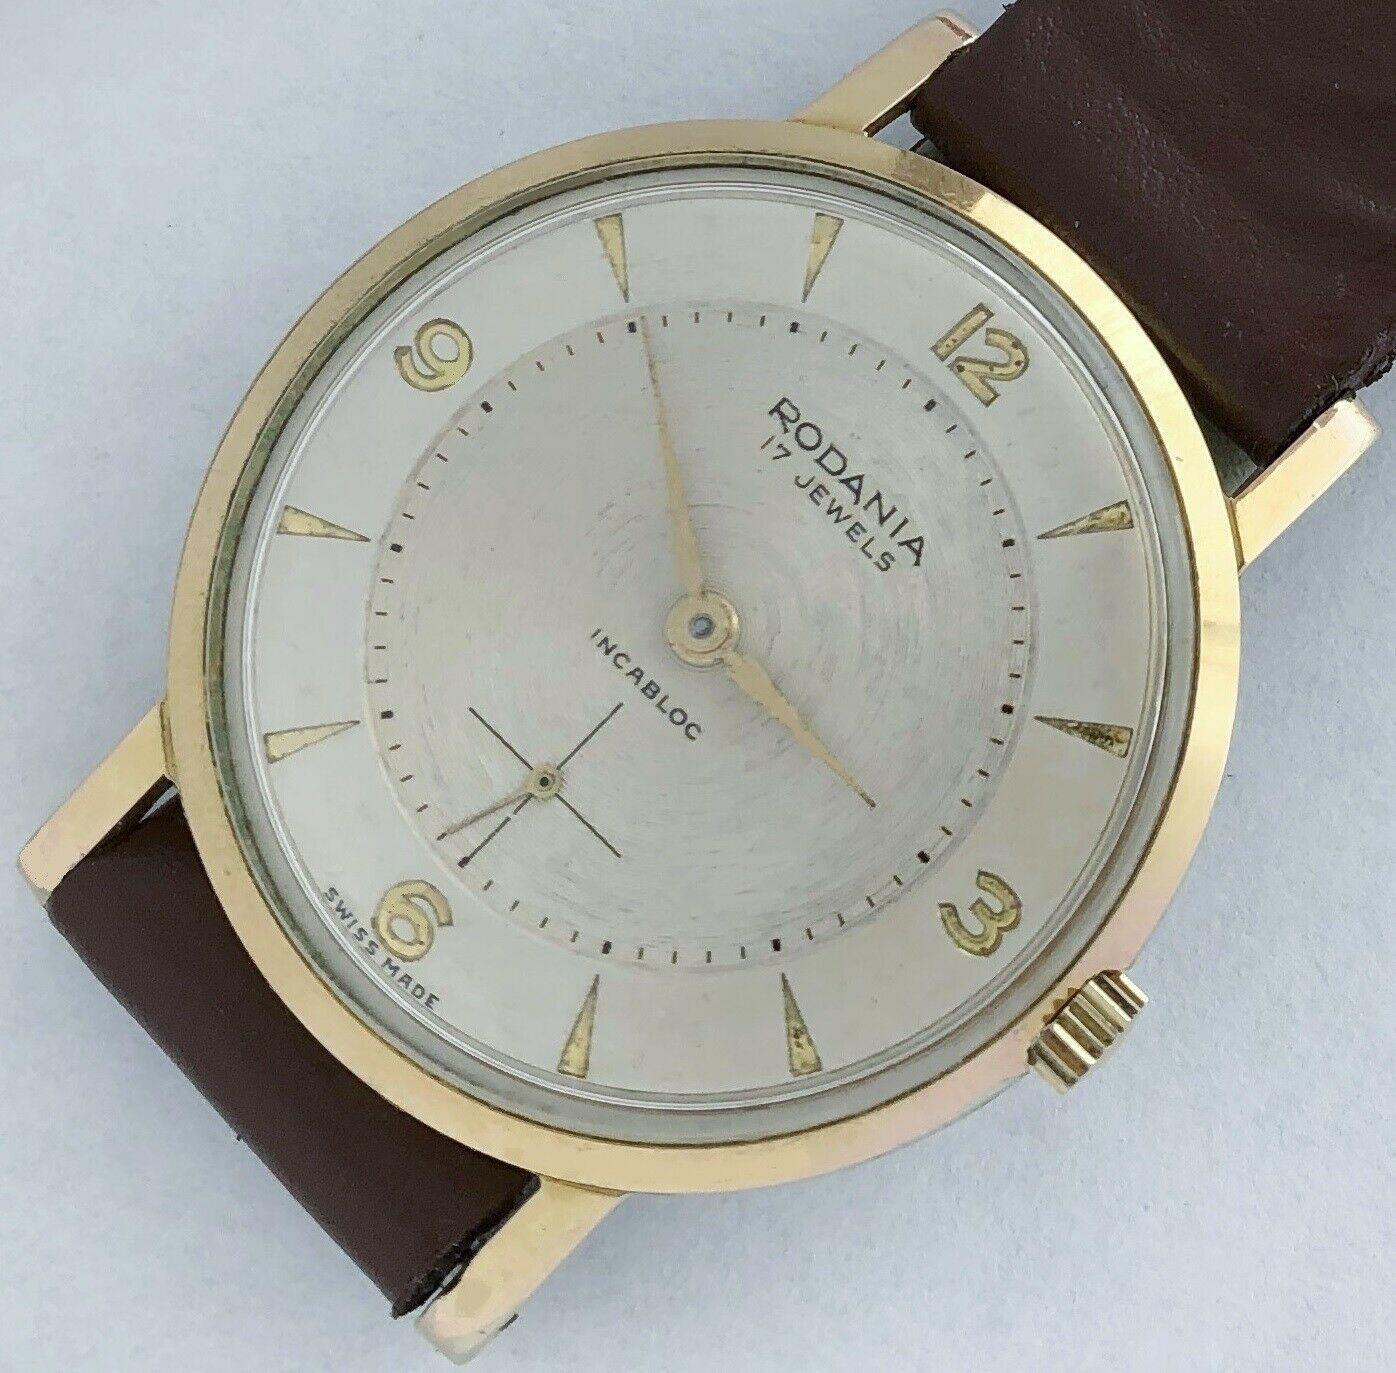 17 Swiss made Rodania Incbloc men's vintage wind up watch.